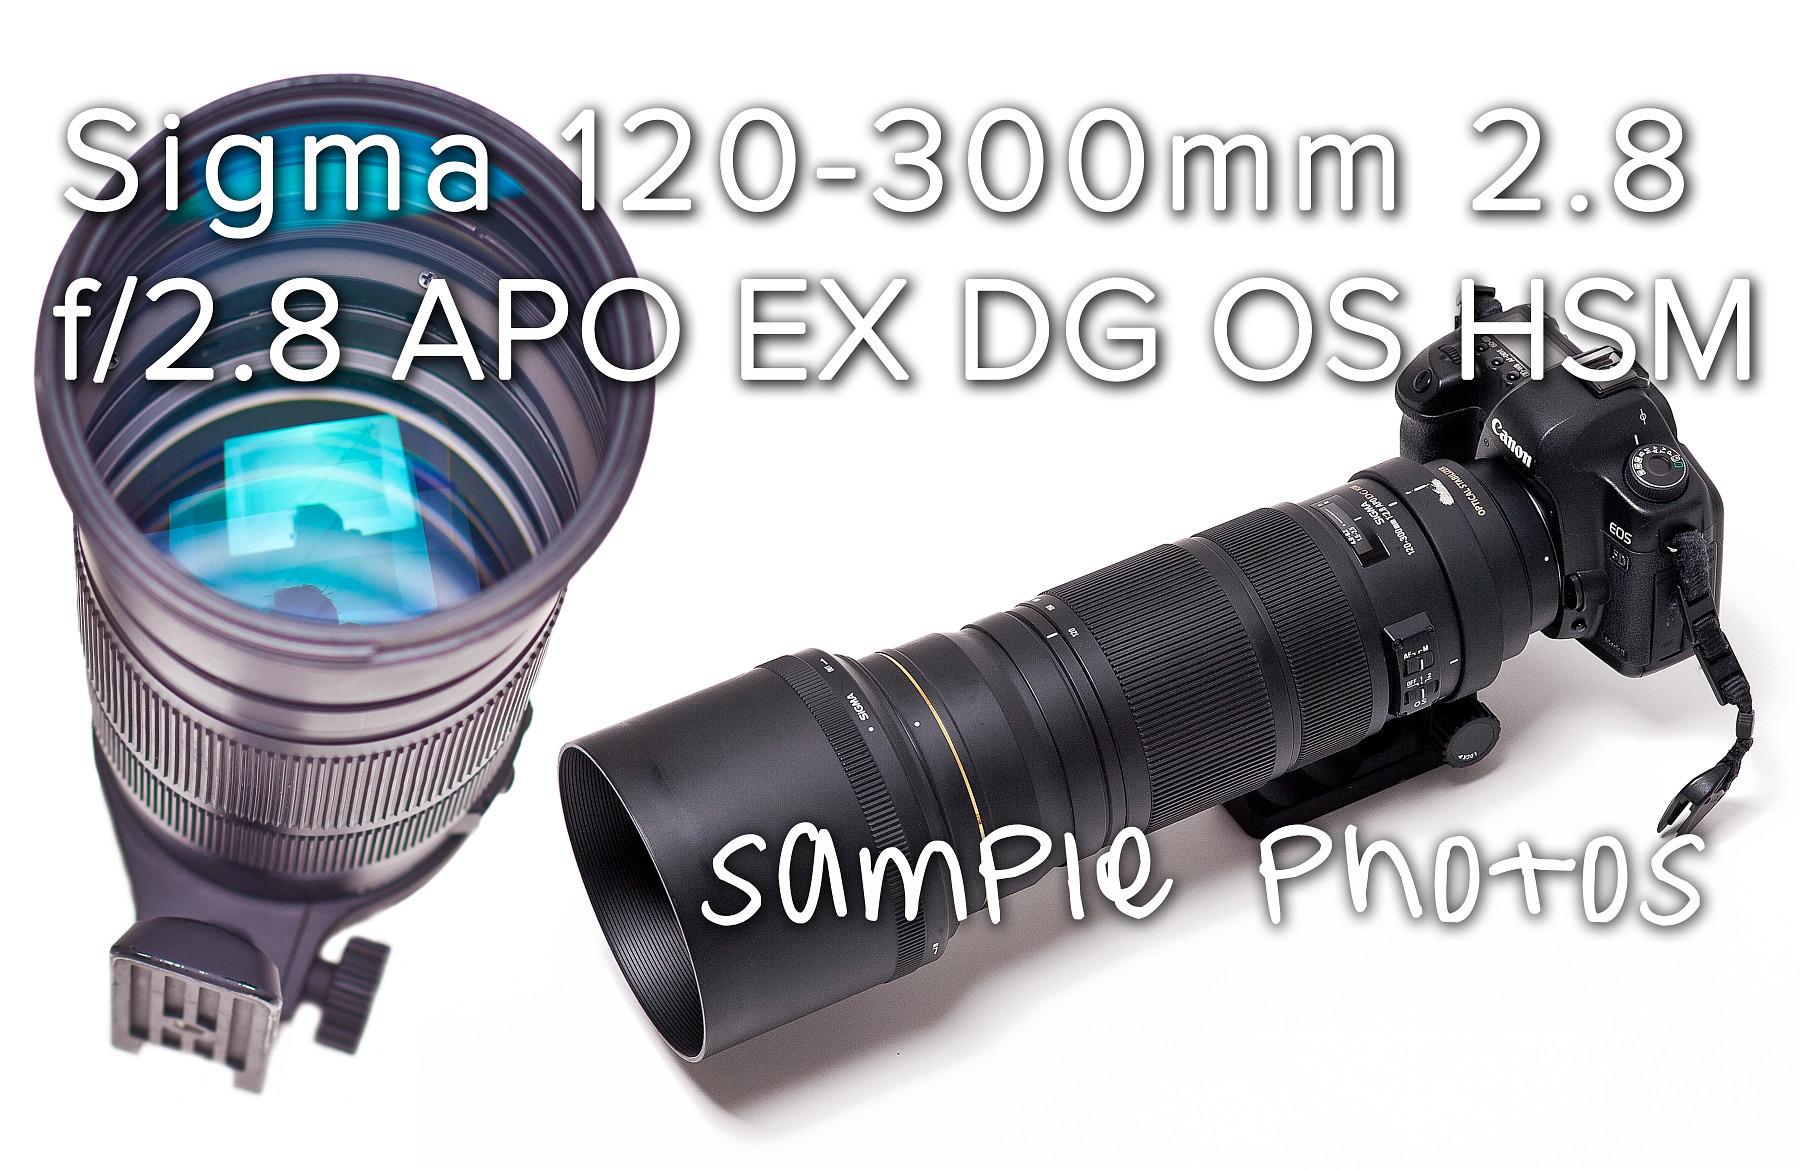 Zdjęcia testowe (51): Sigma 120-300 mm  f/2.8 APO EX DG OS HSM  + Canon 5D Mark II . sample